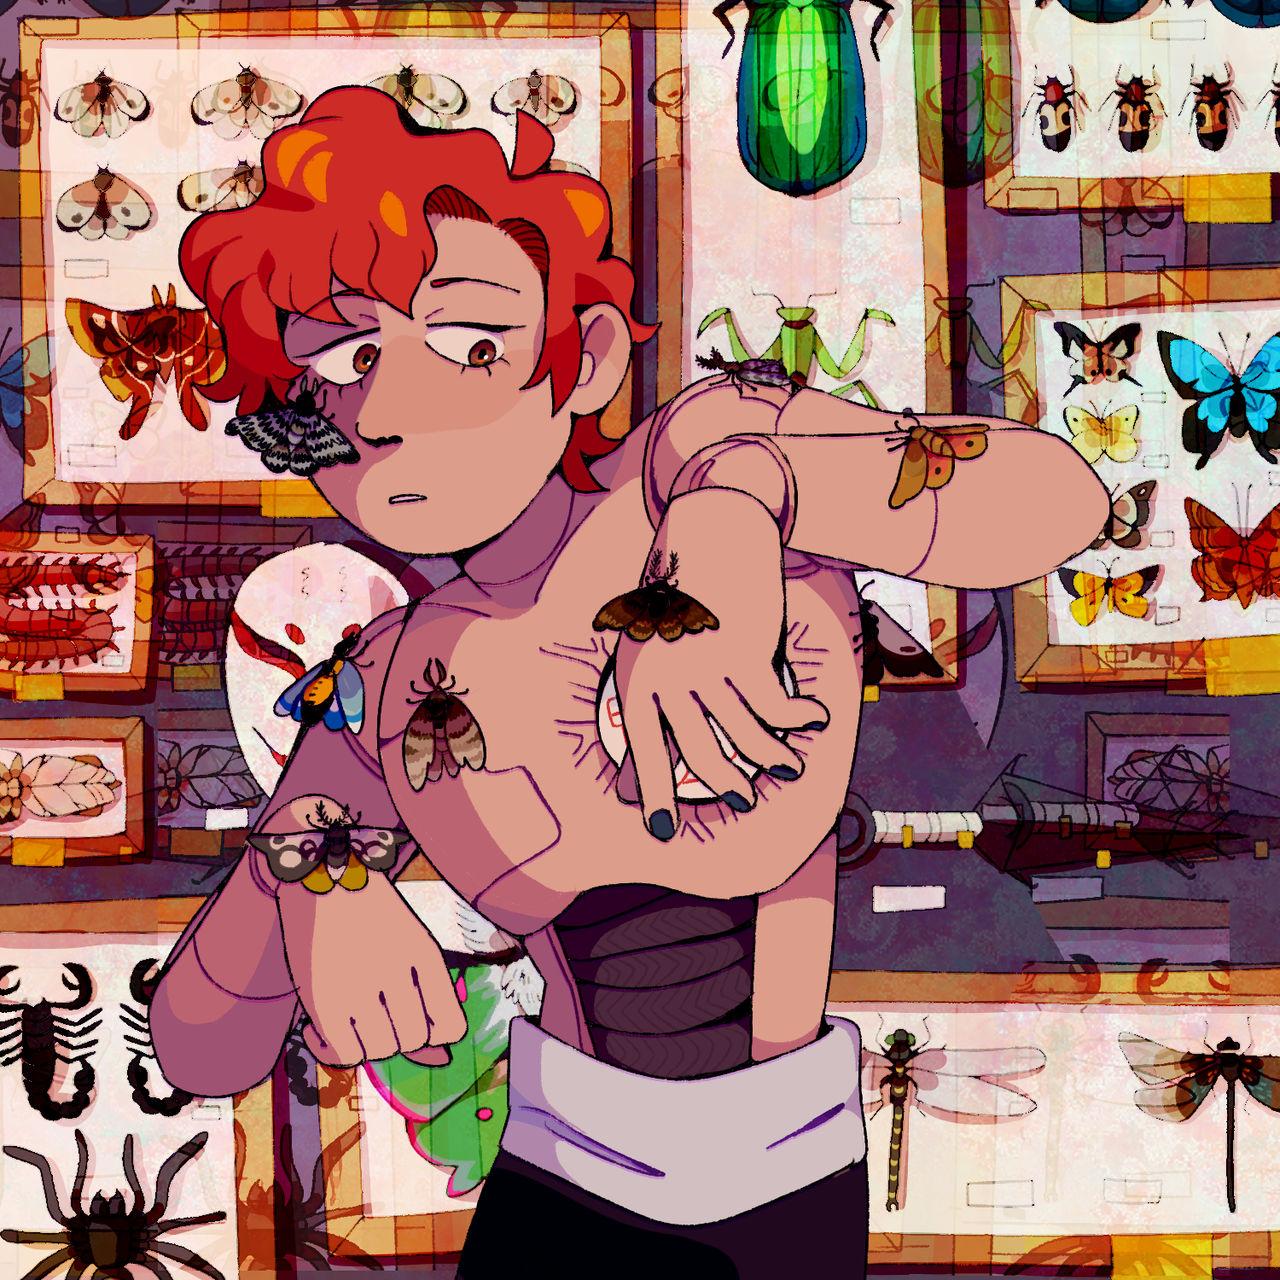 sasori insect illustration